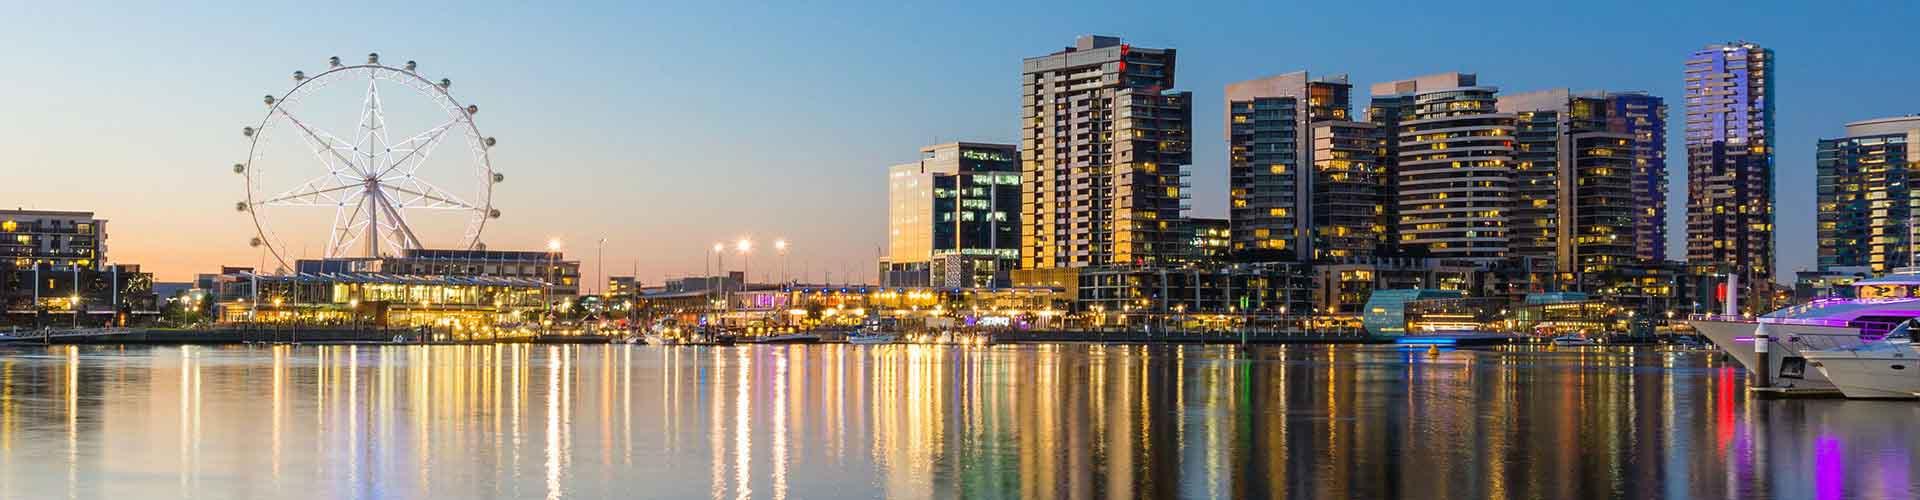 Melbourne – Retkeily kaupungiosassa Carlton. Melbourne -karttoja, valokuvia ja arvosteluja kaikista Melbourne -retkeilyalueista.